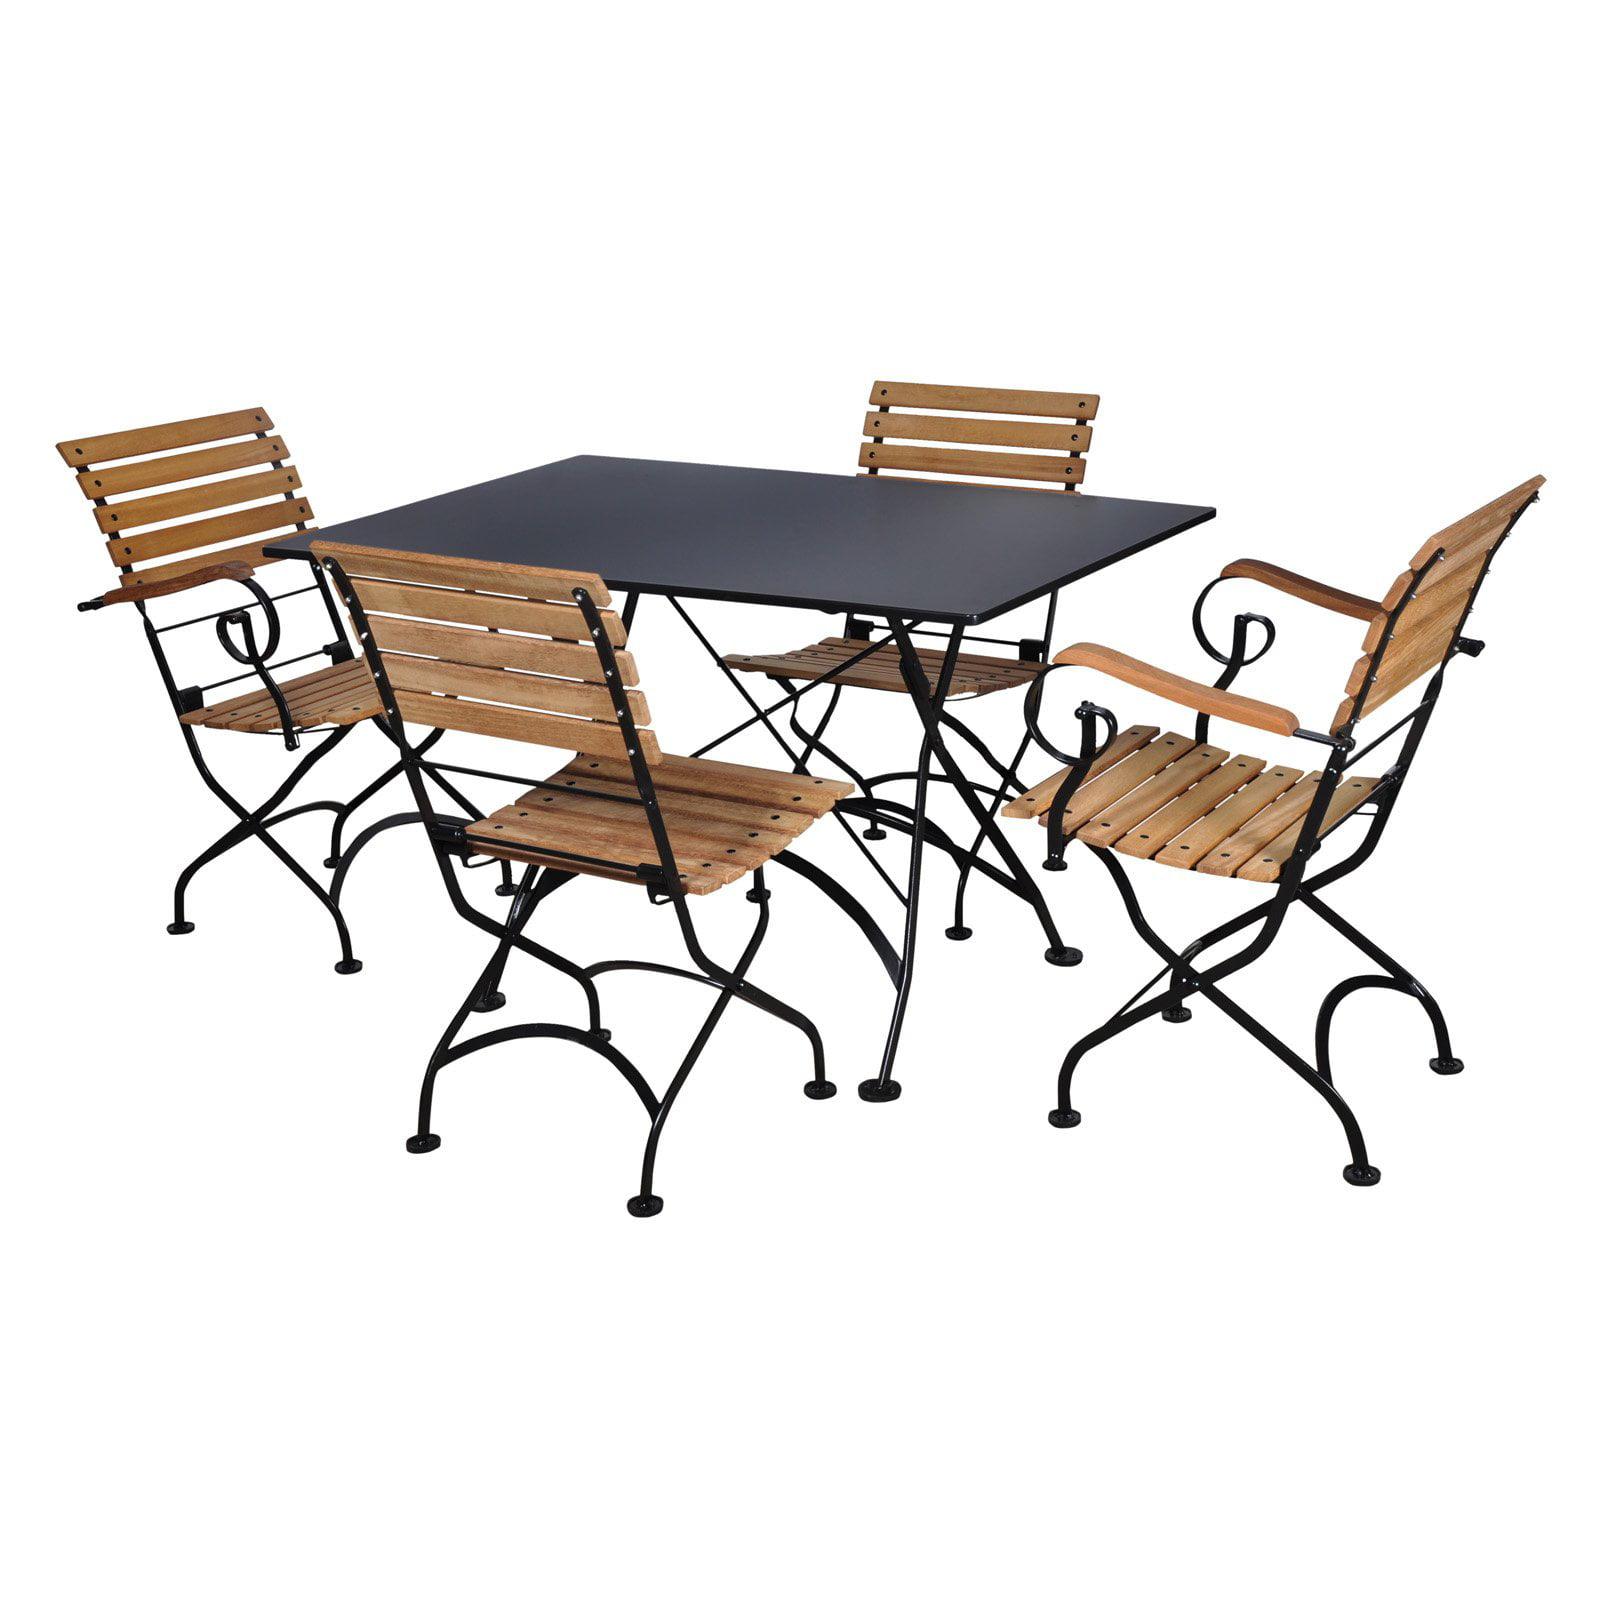 Furniture Designhouse French Cafe Bistro Teak Wood 5 Piece Rectangular Folding Patio Dining Room... by